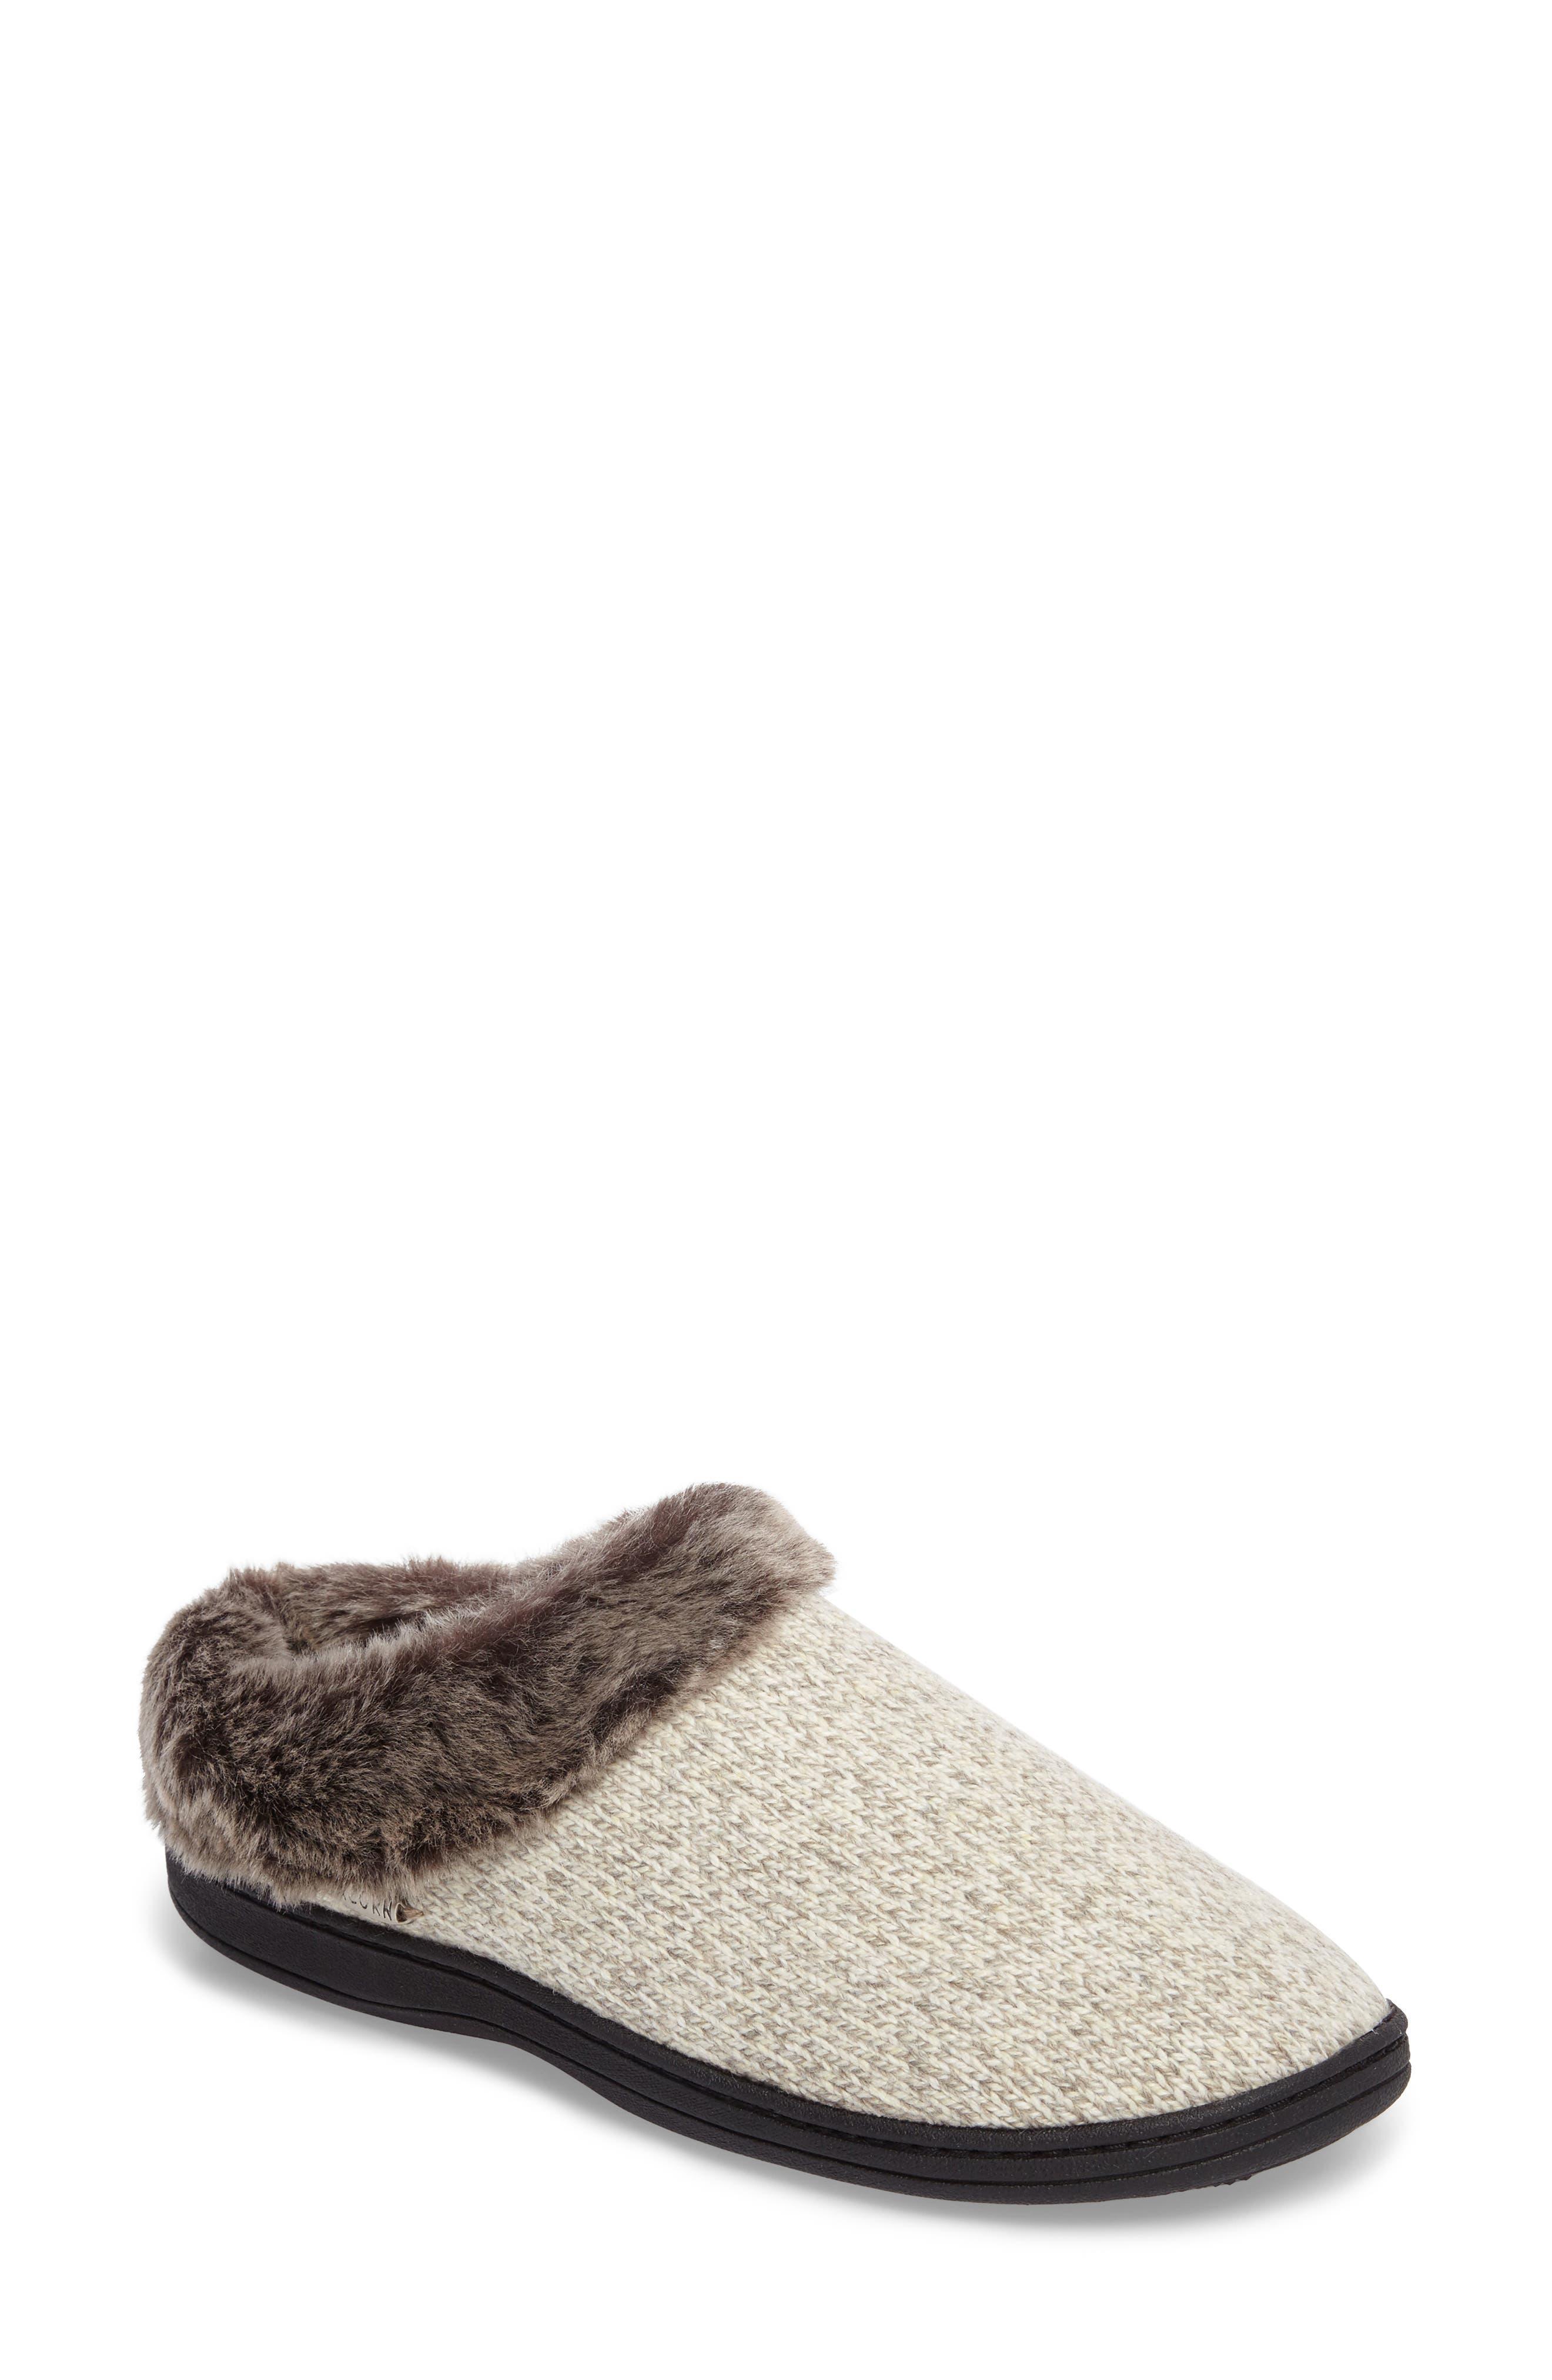 ACORN, Chinchilla Faux Fur Slipper, Main thumbnail 1, color, CHARCOAL HEATHER